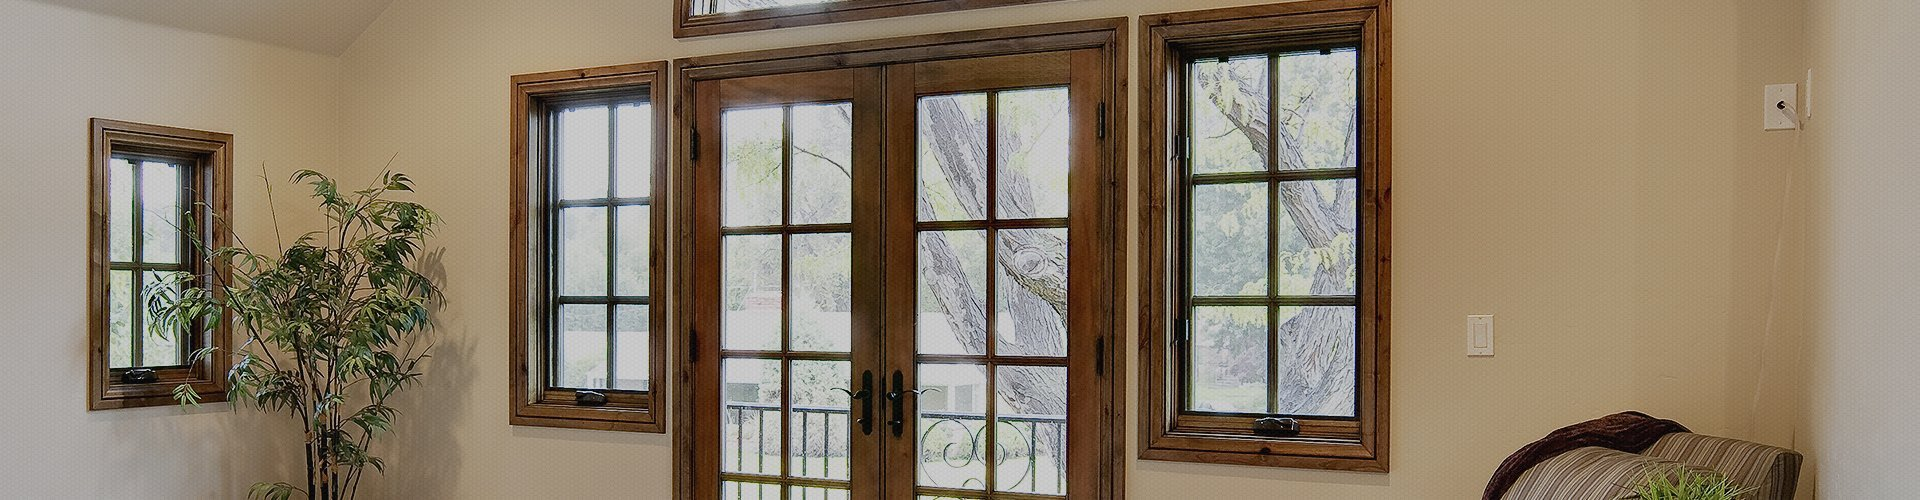 window wooden frame